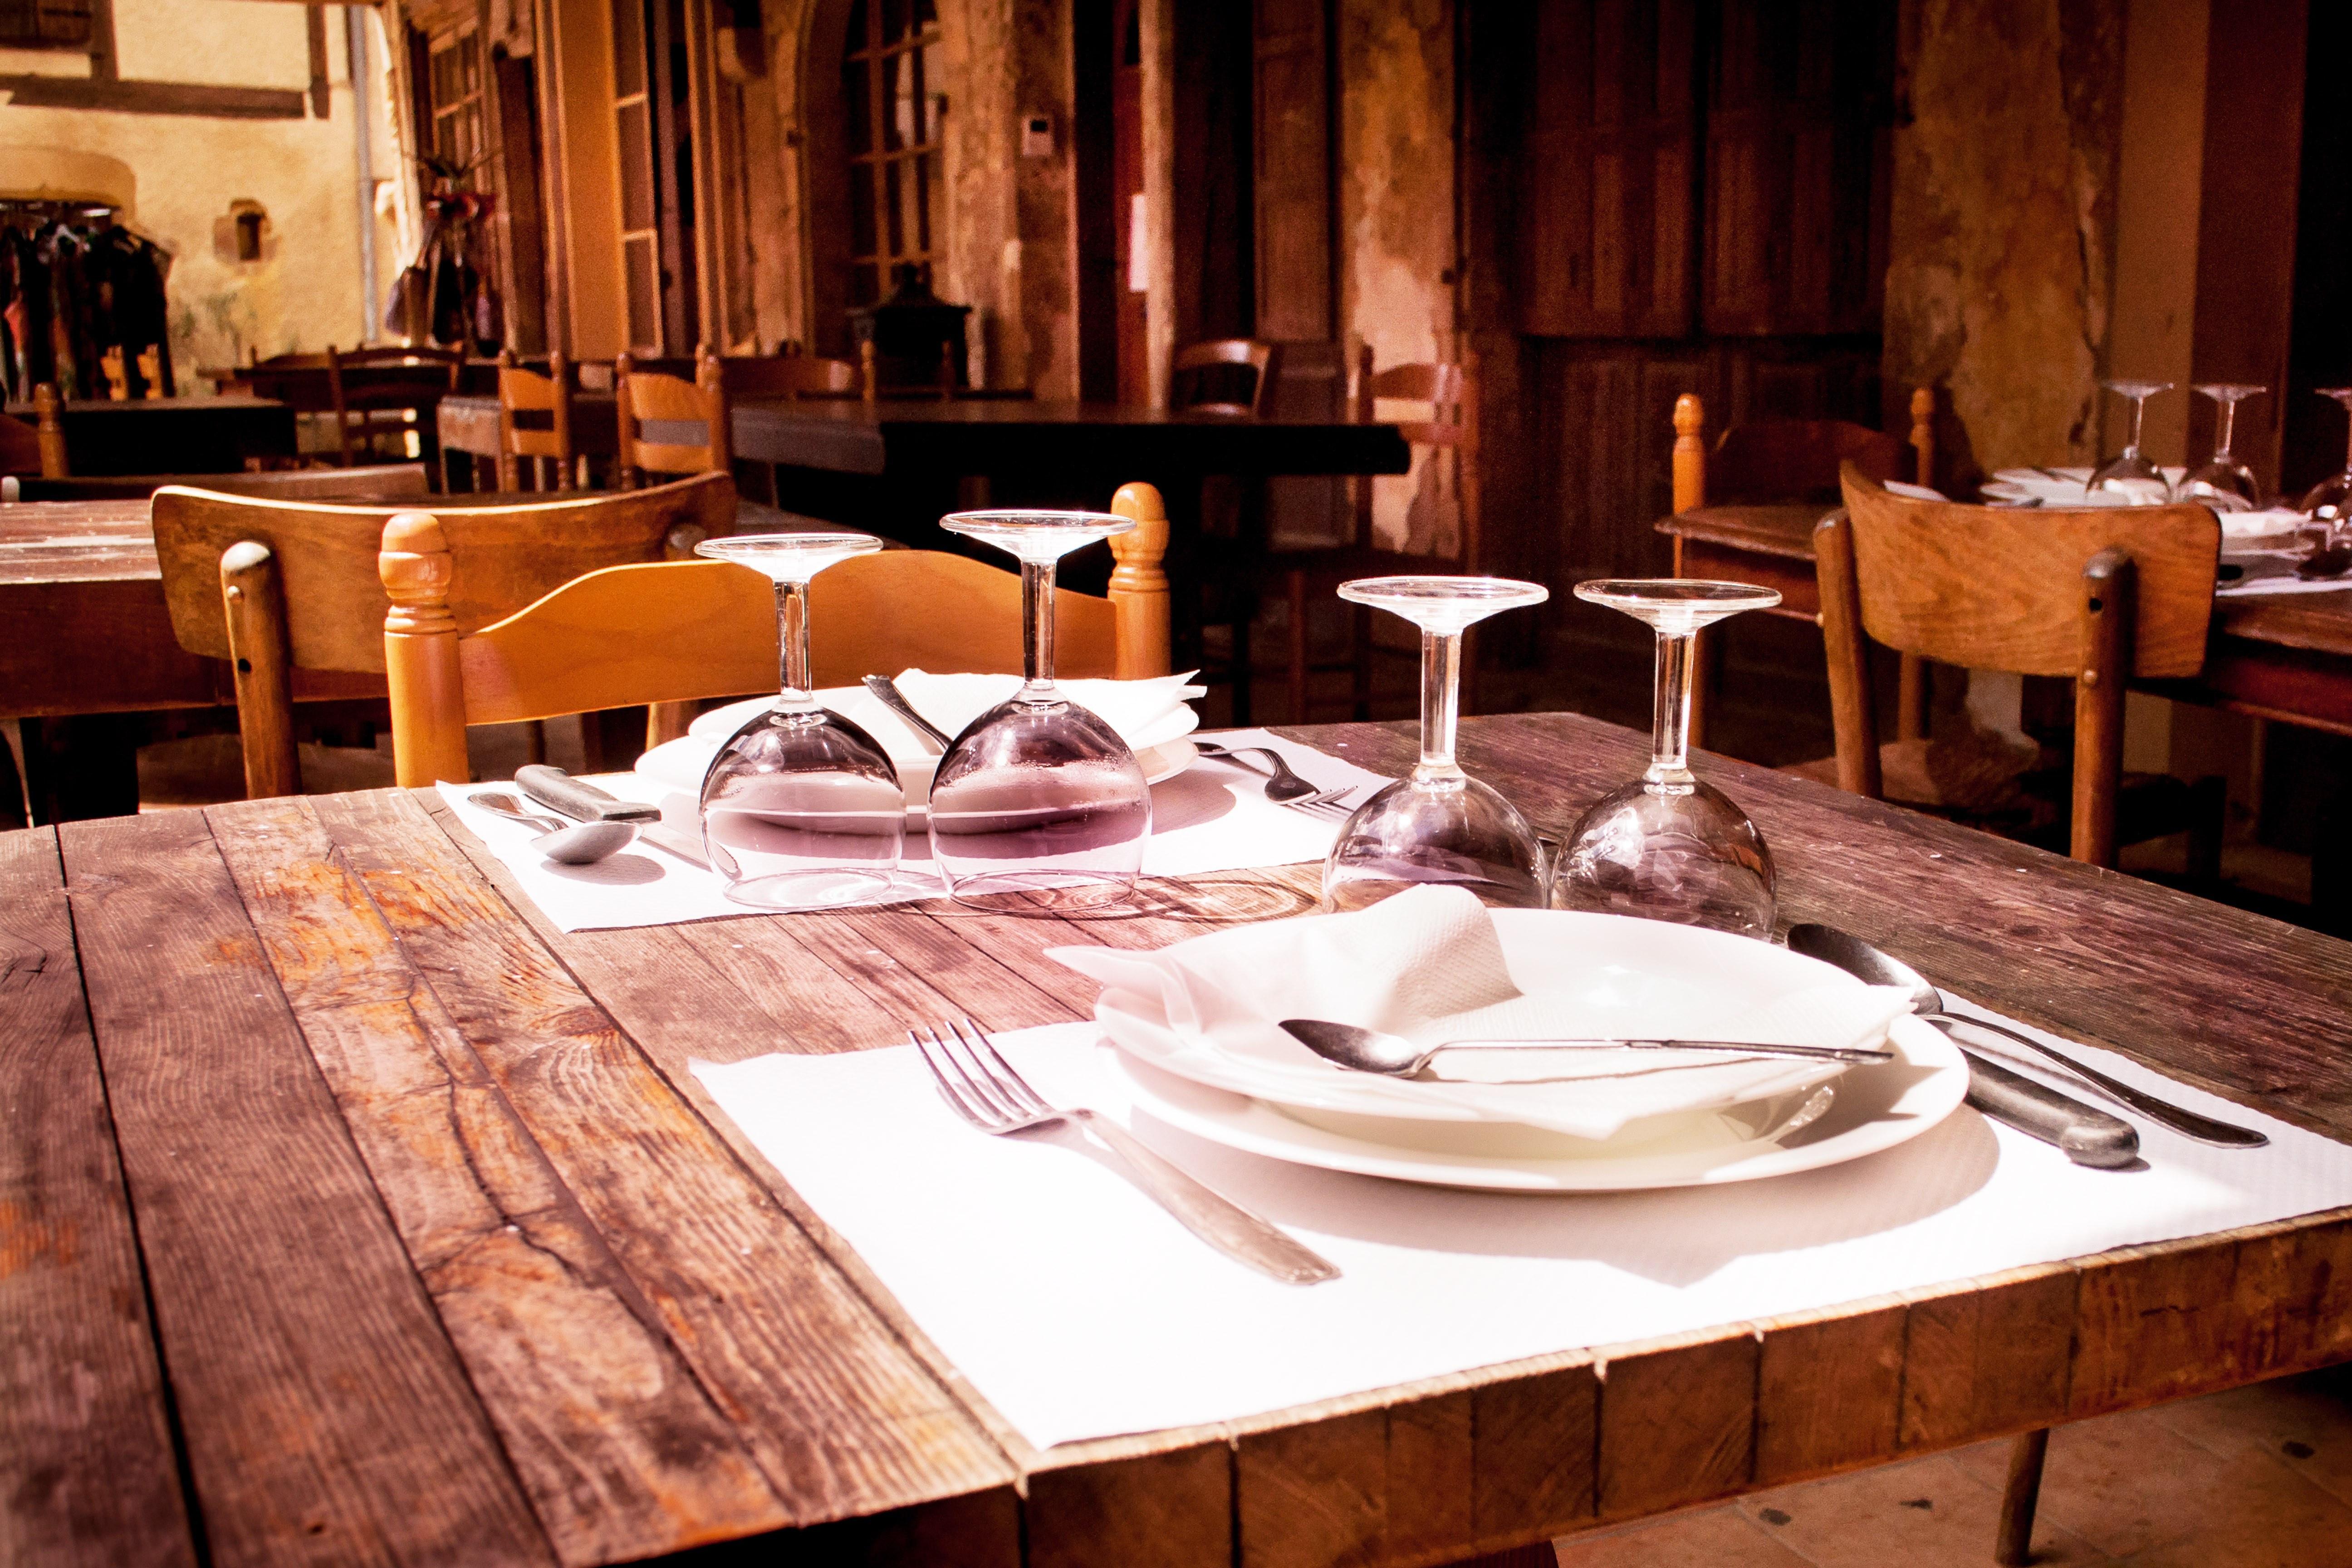 Breakfast Restaurants Open On Thanksgiving  11 restaurants open on Thanksgiving